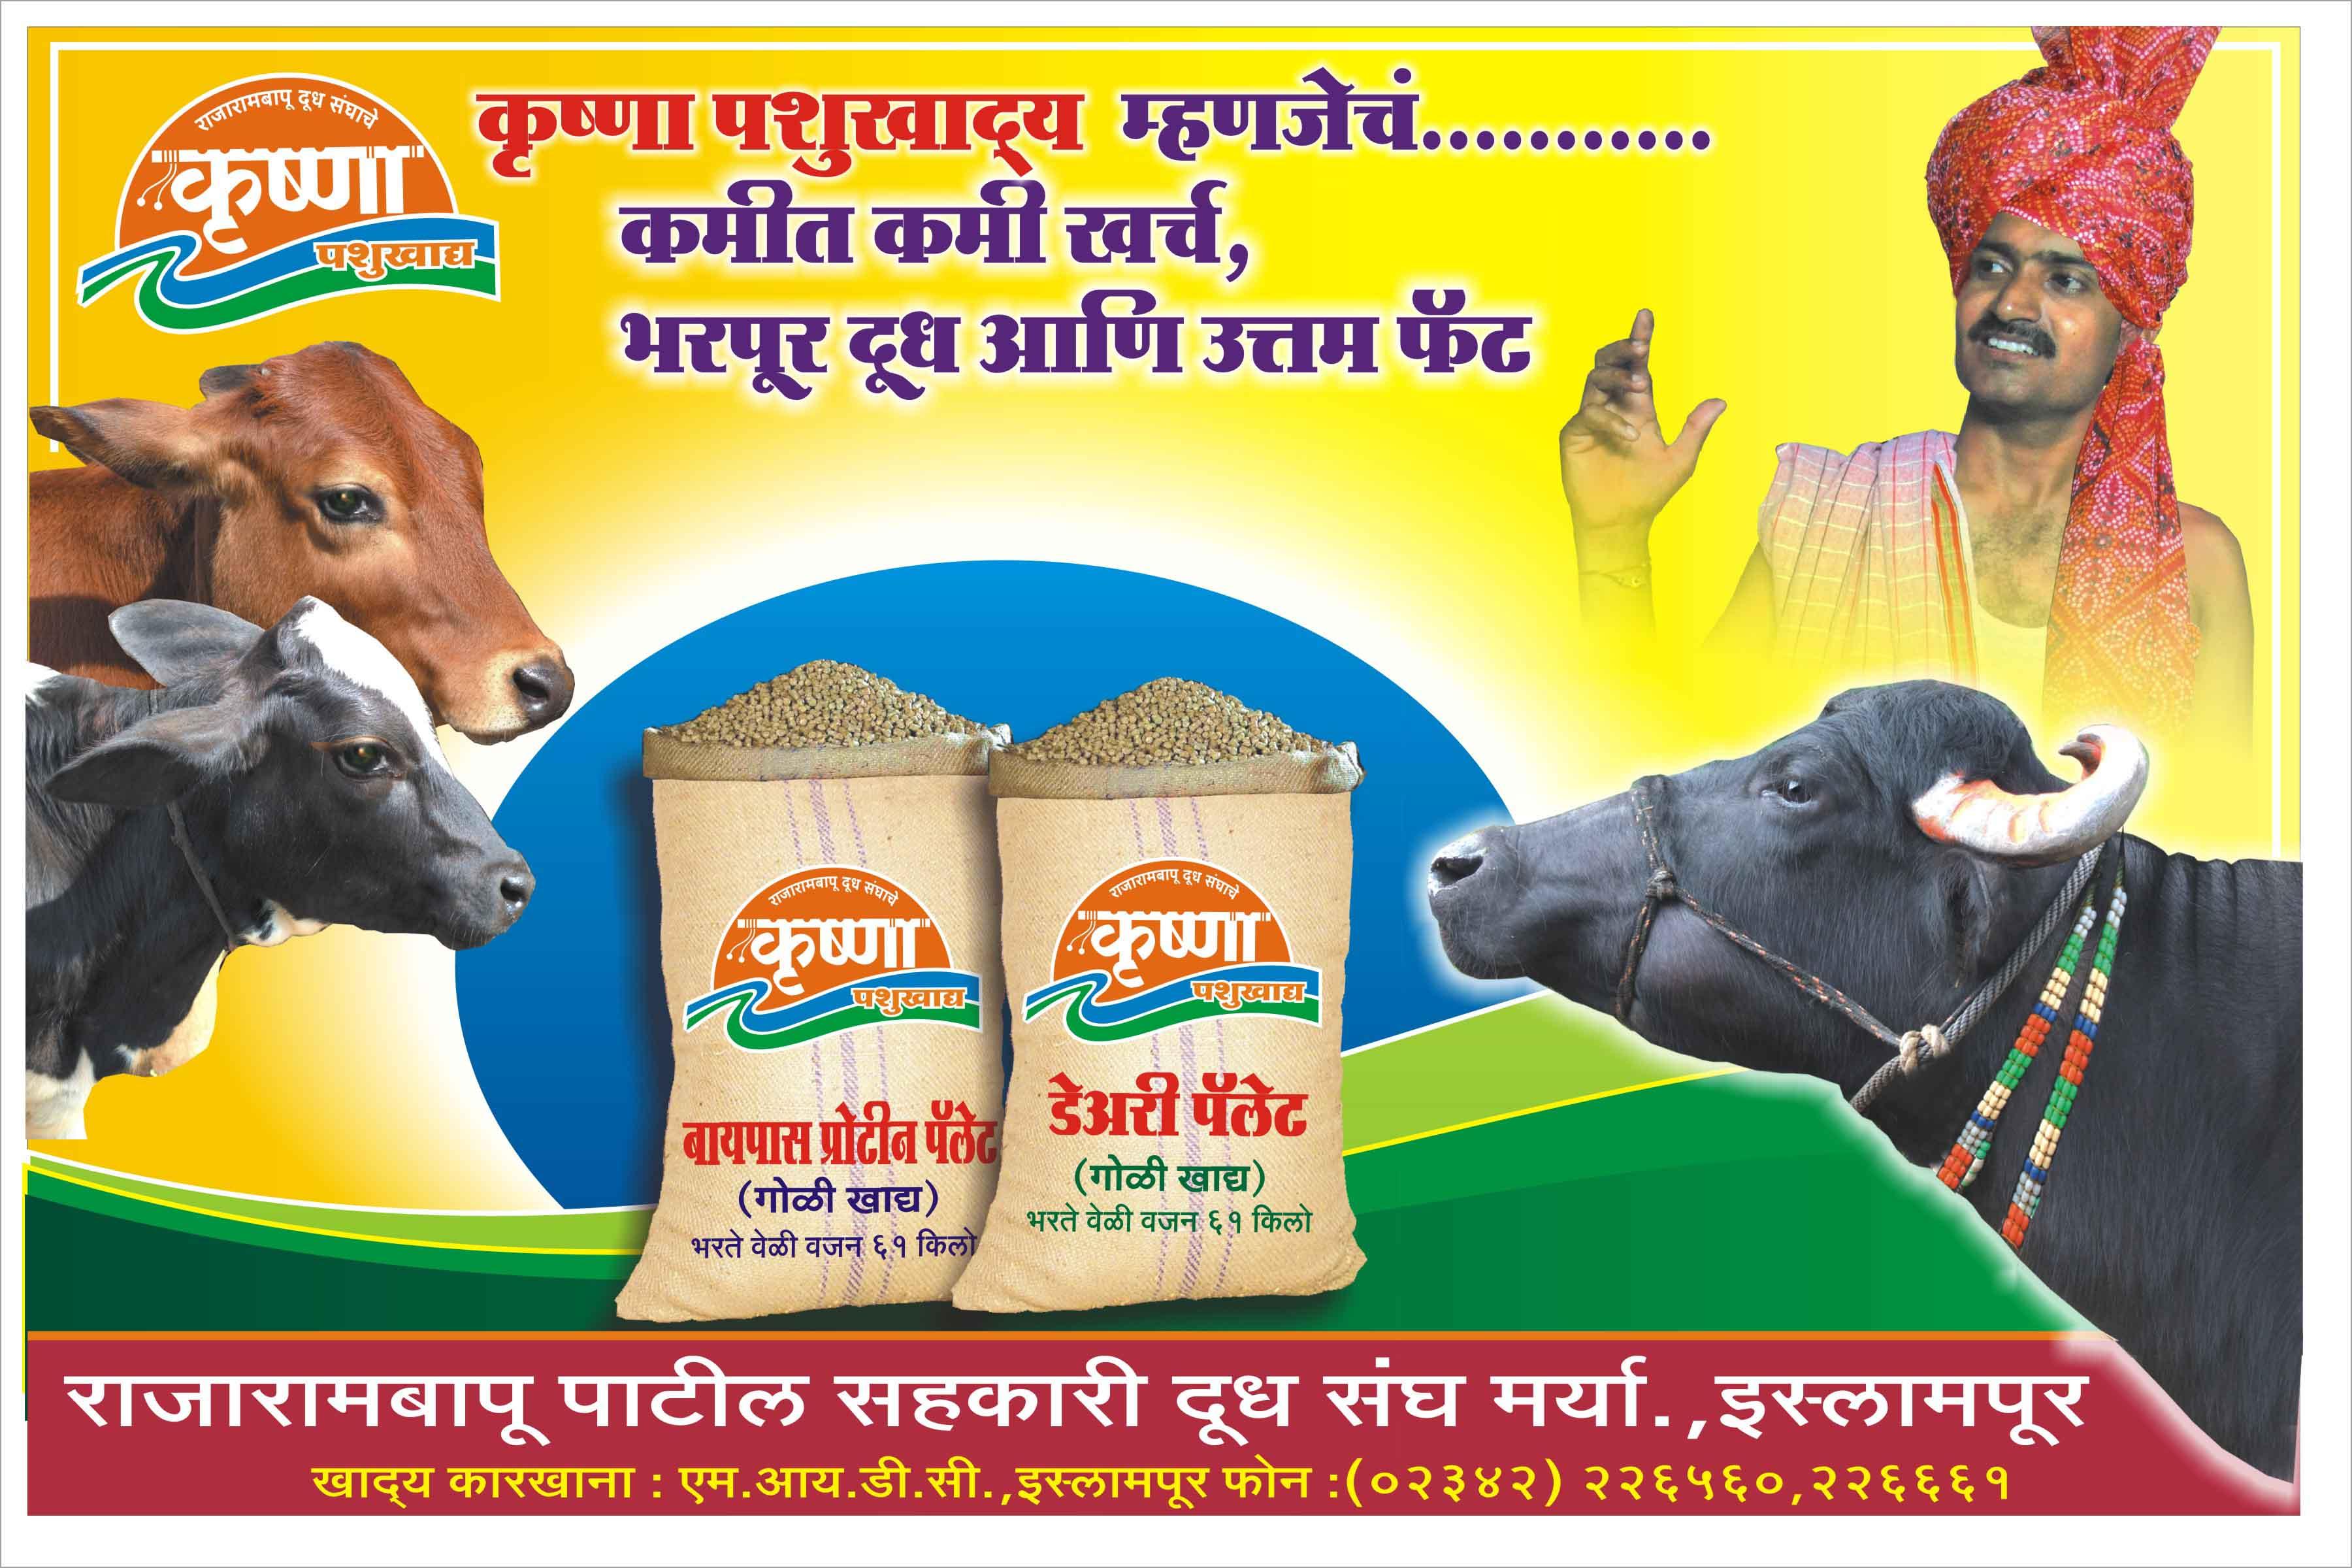 Rajarambapu Patil Sah Dudh Sangh Ltd Islampur